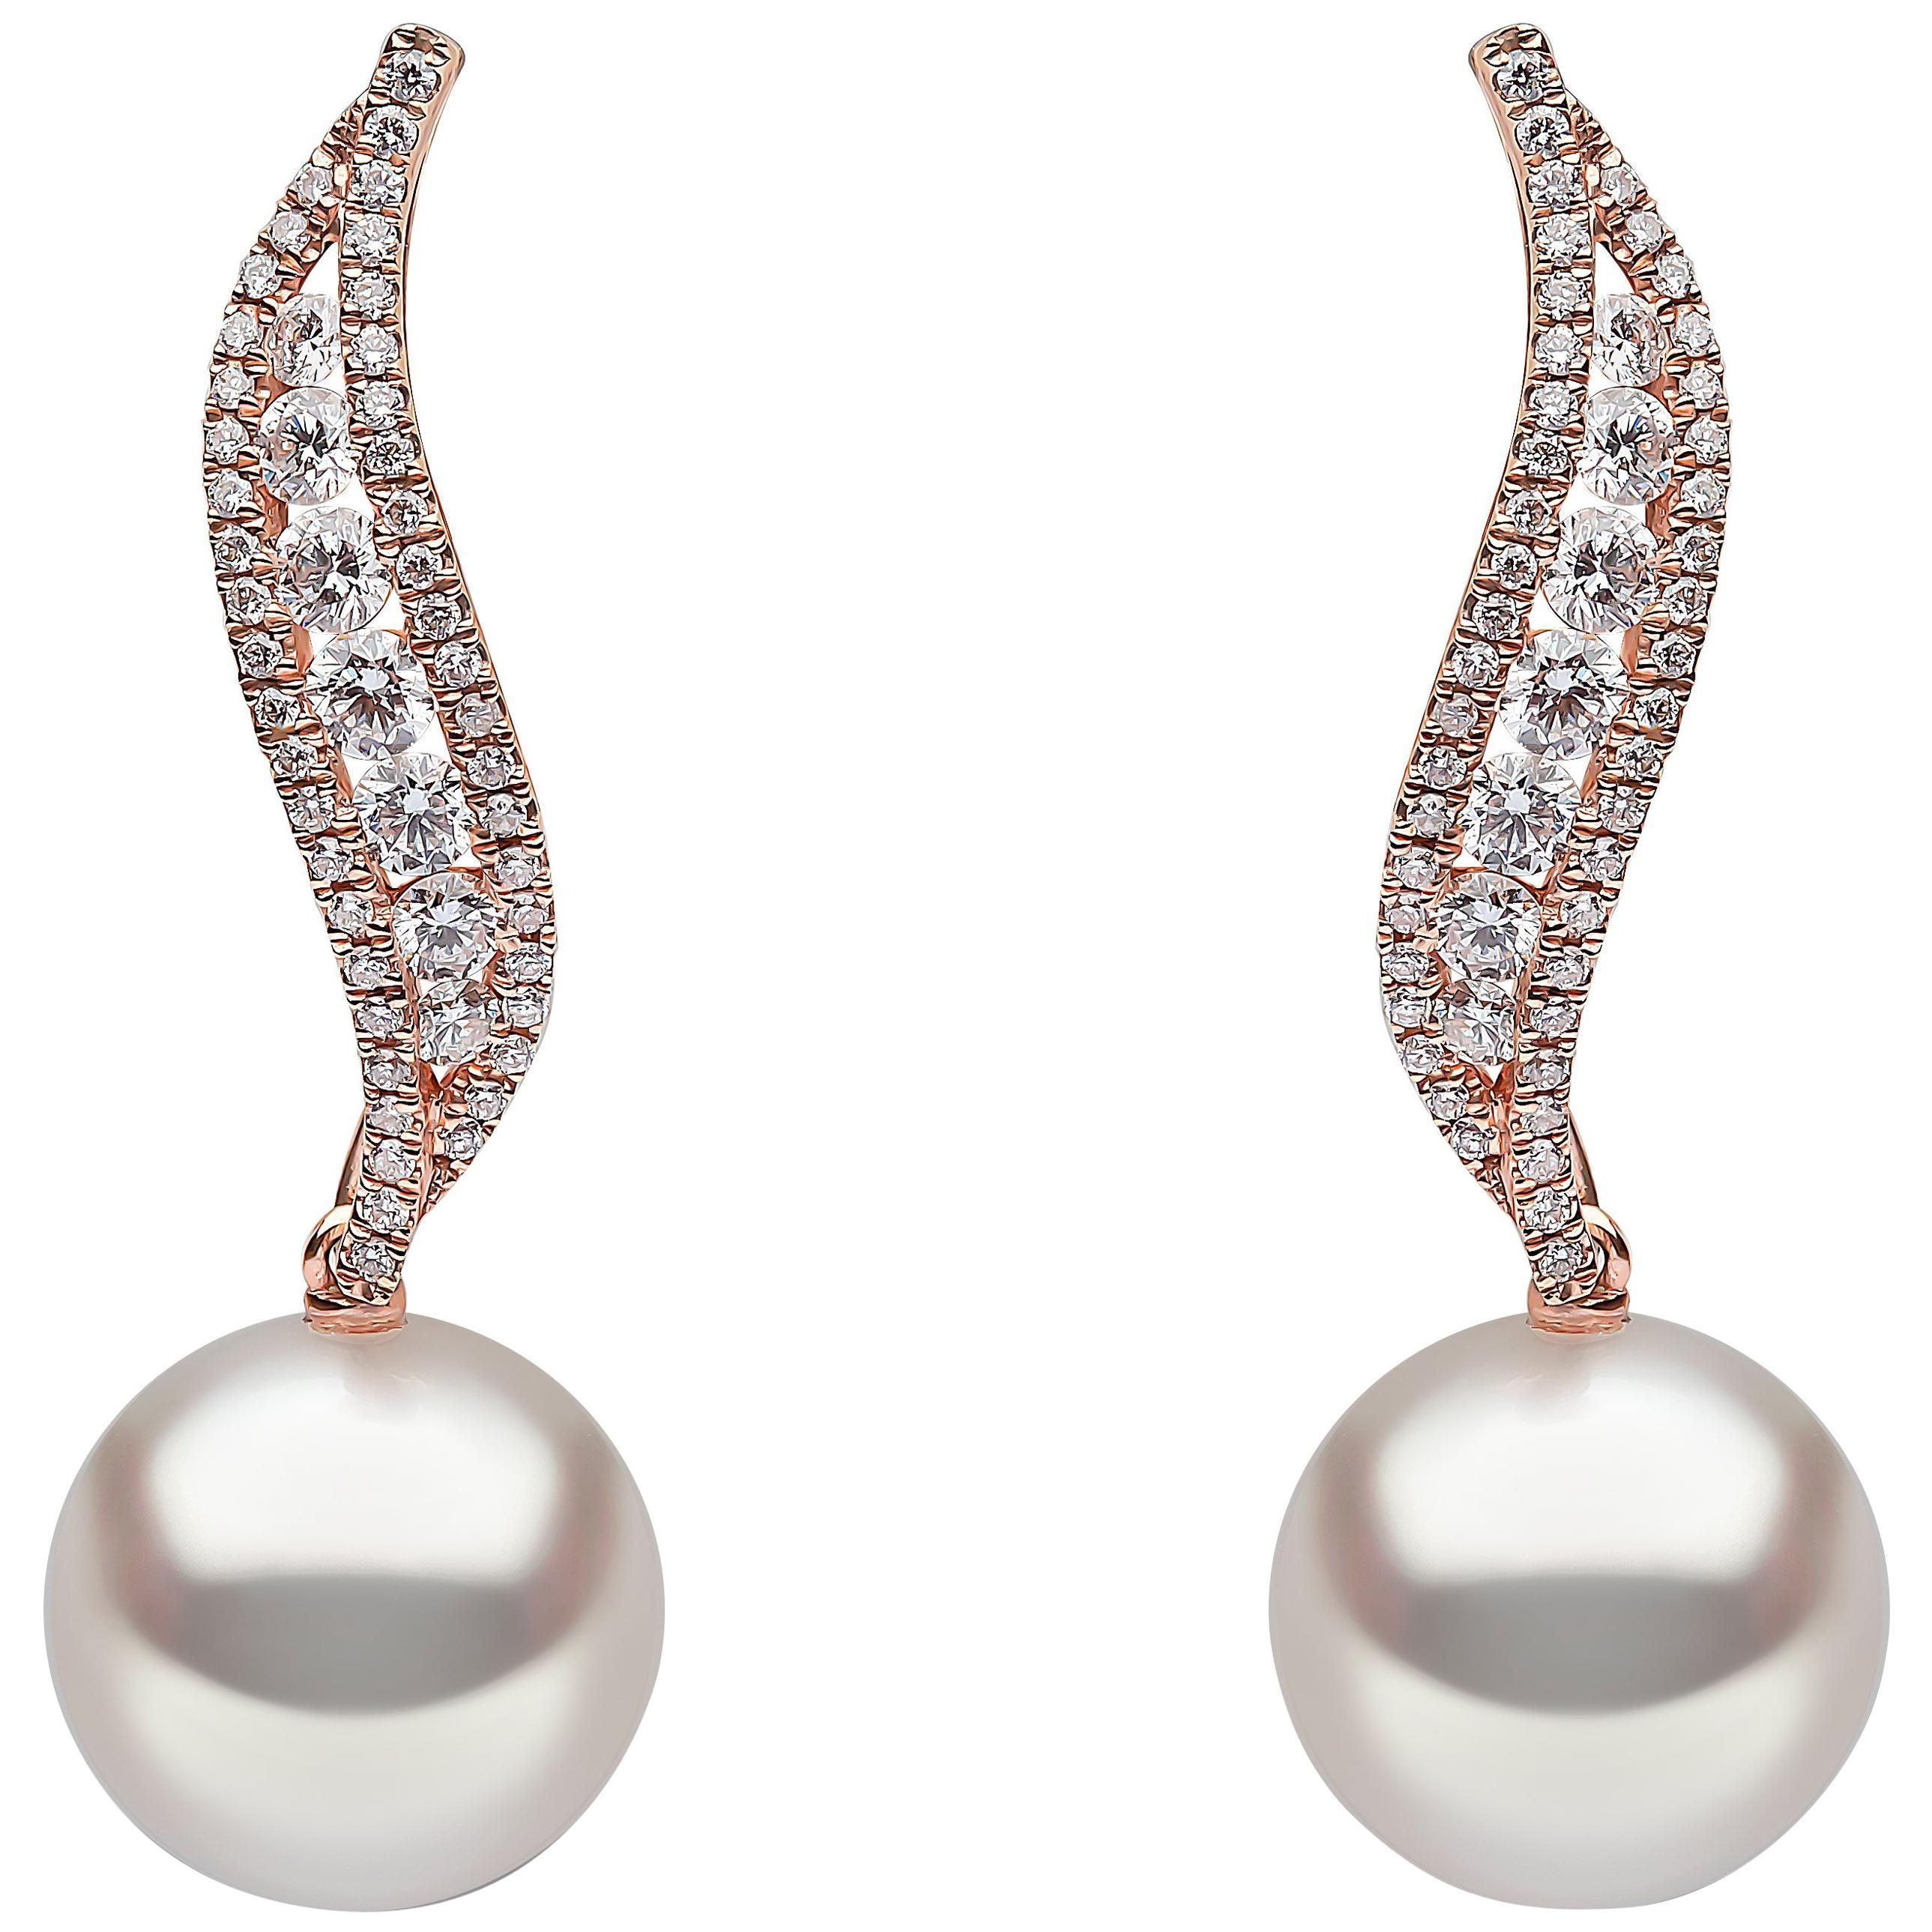 Yoko London South Sea Pearl and Diamond Earrings in 18 Karat Rose Gold